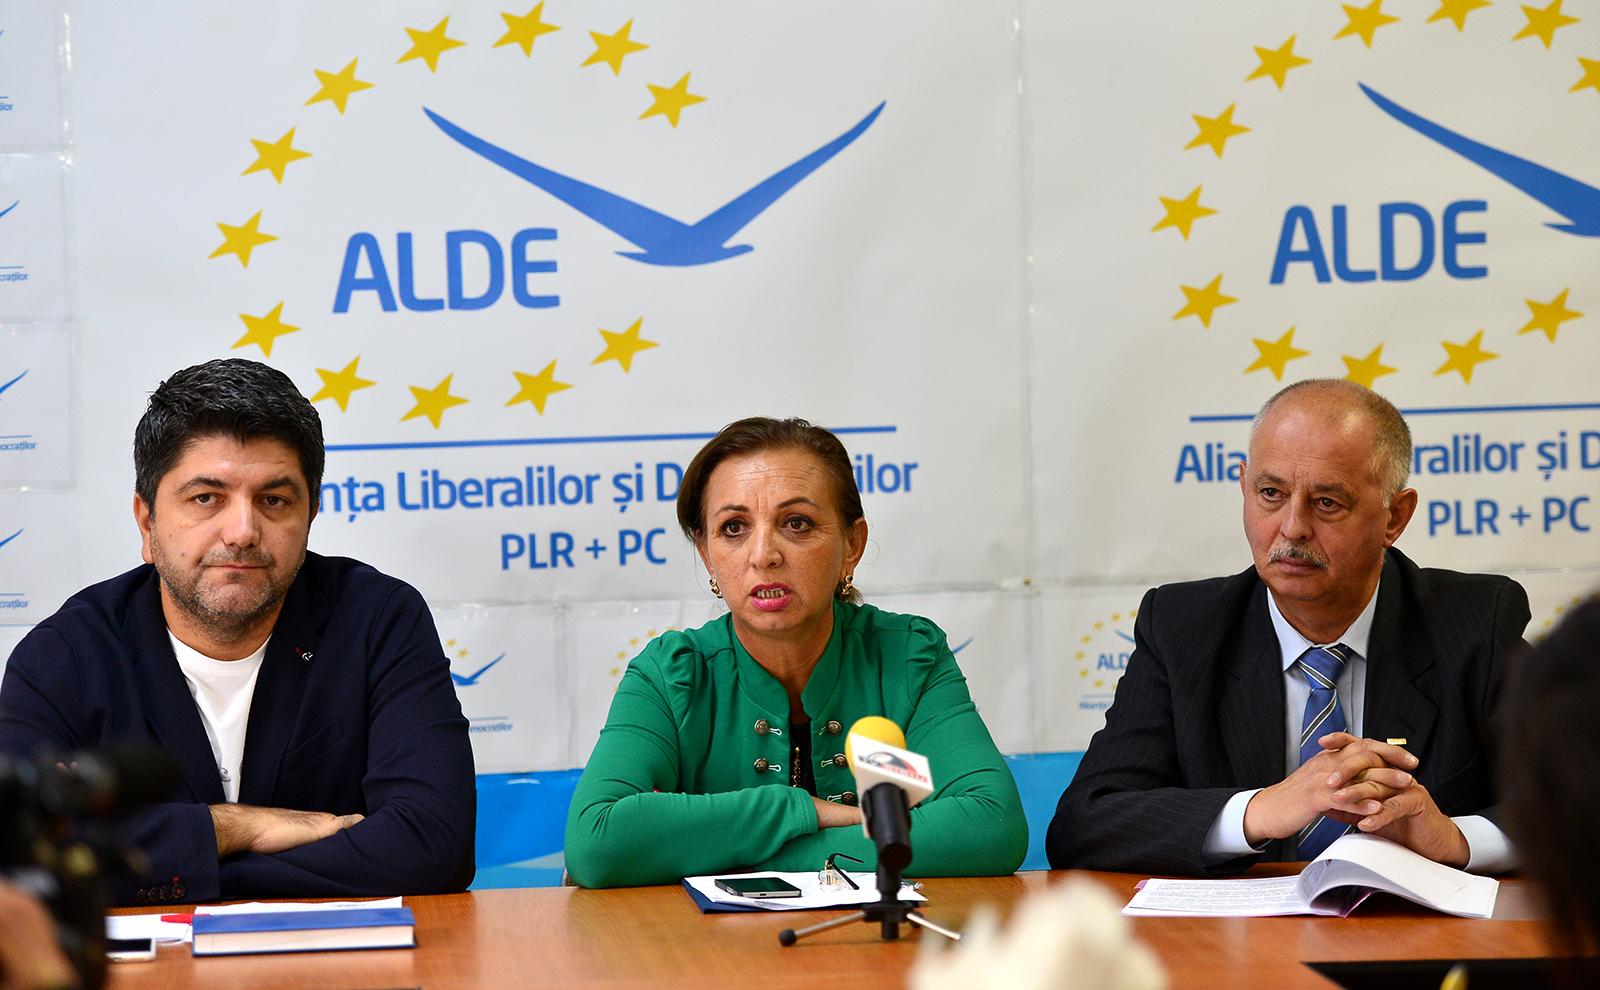 Consilierul Dana Varga, la Sibiu: